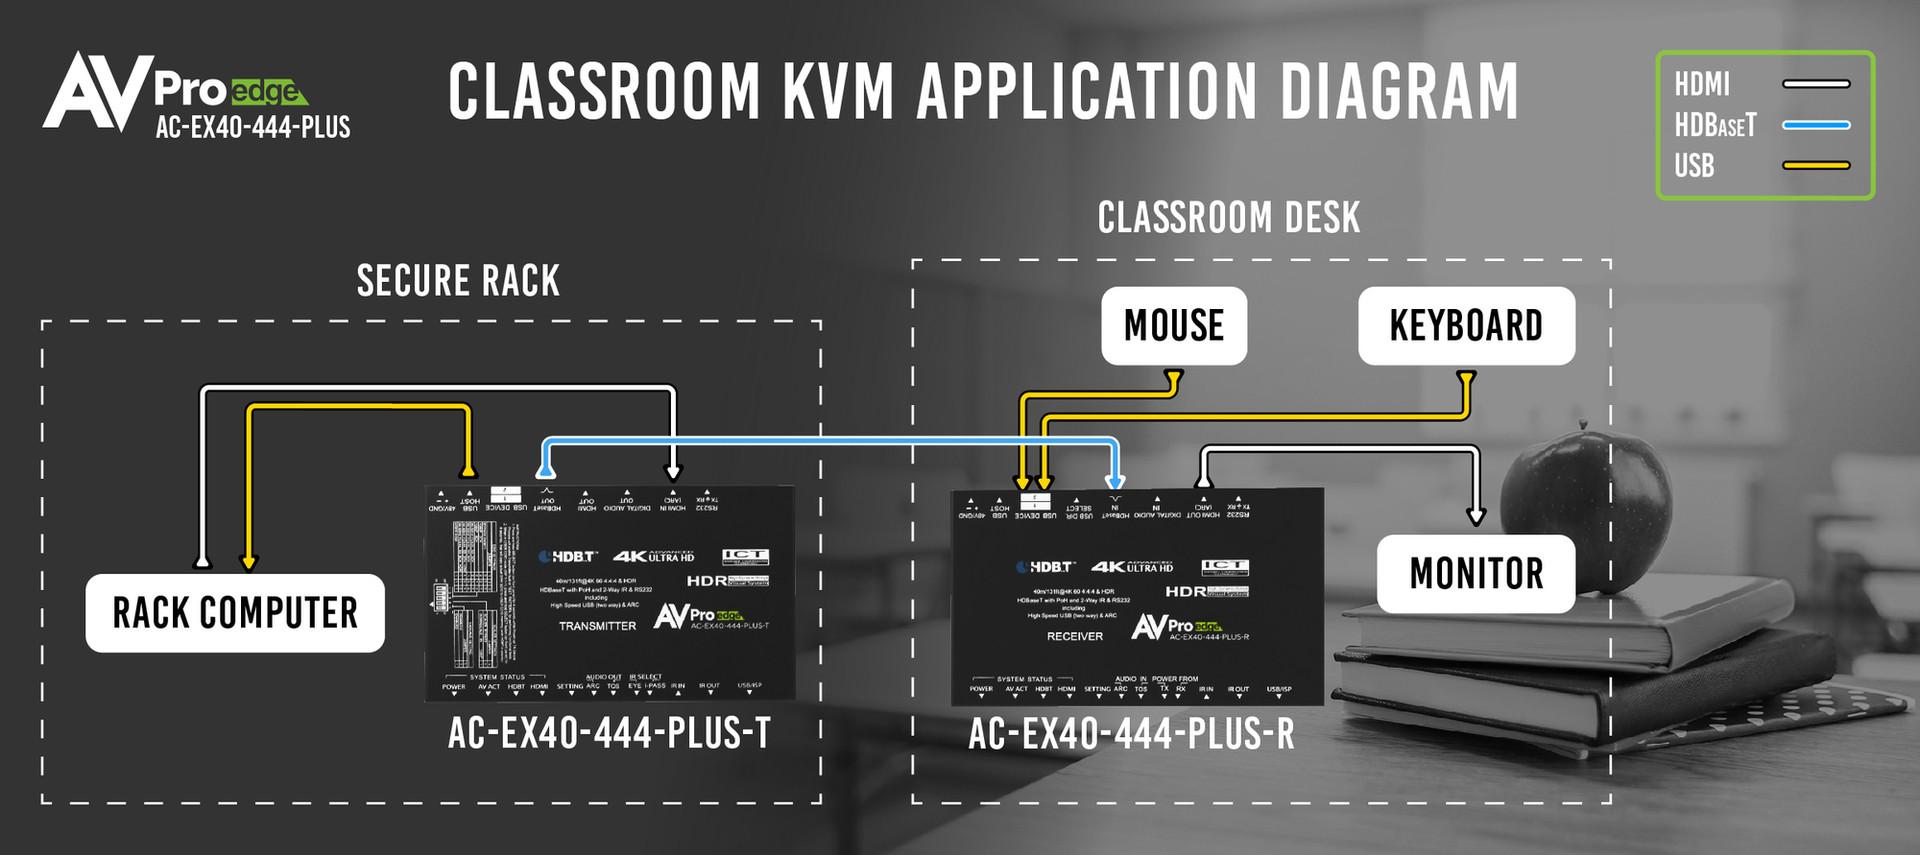 AC-EX40-444-PLUS Classroom KVM Applicati